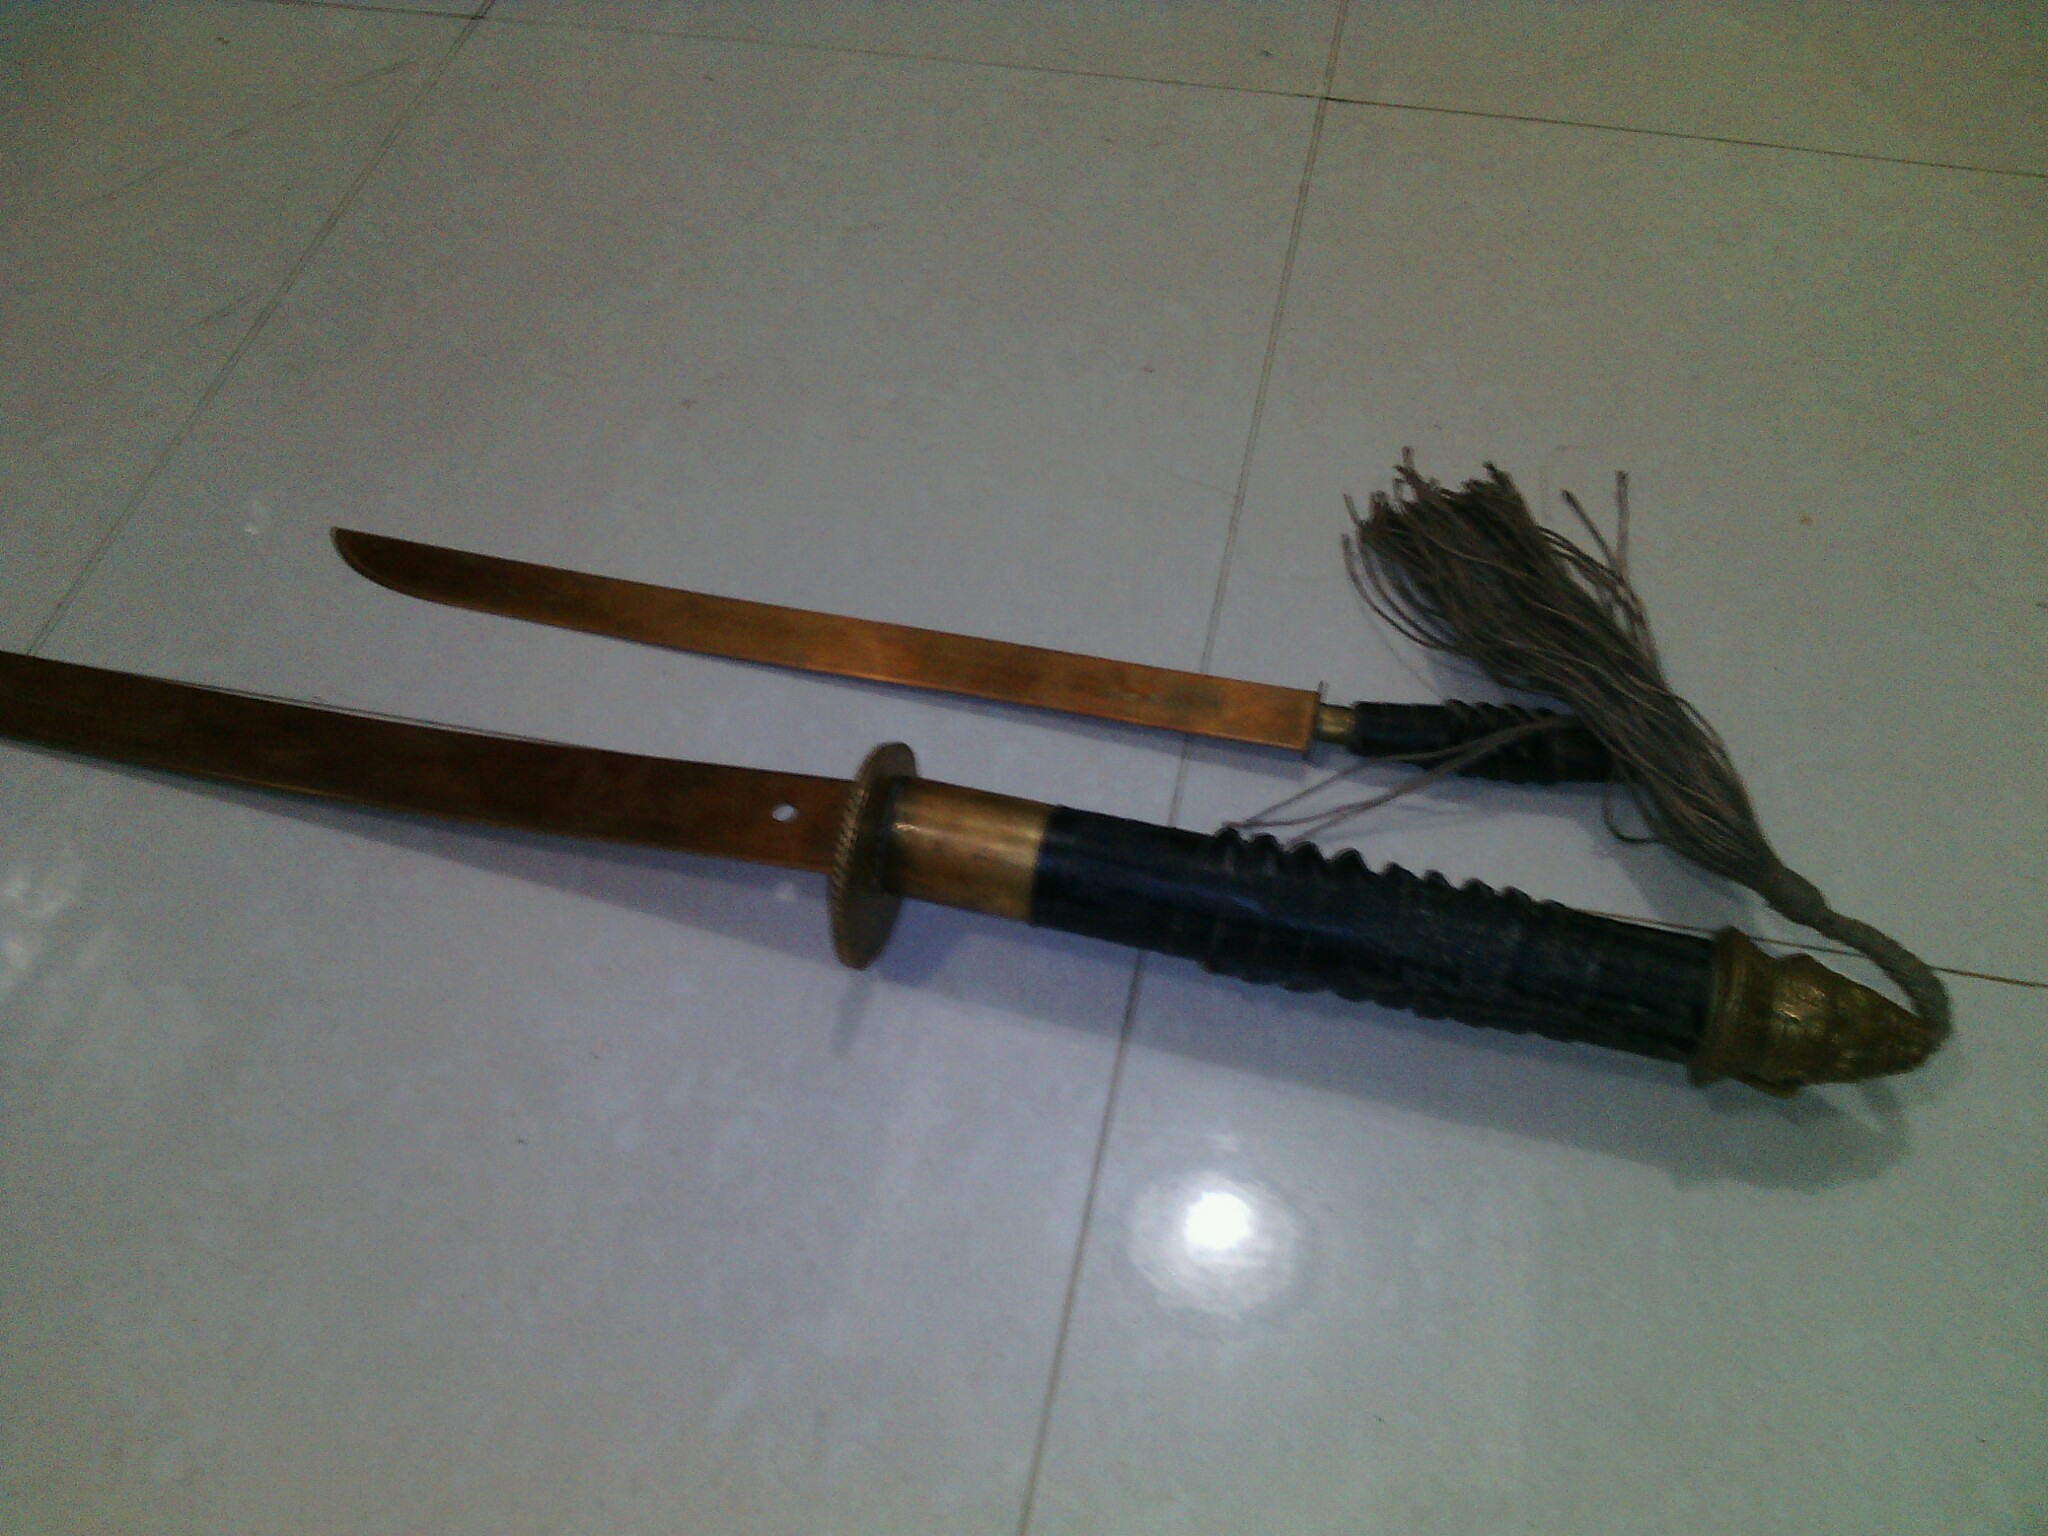 harga samurai antik japan origin Tokopedia.com